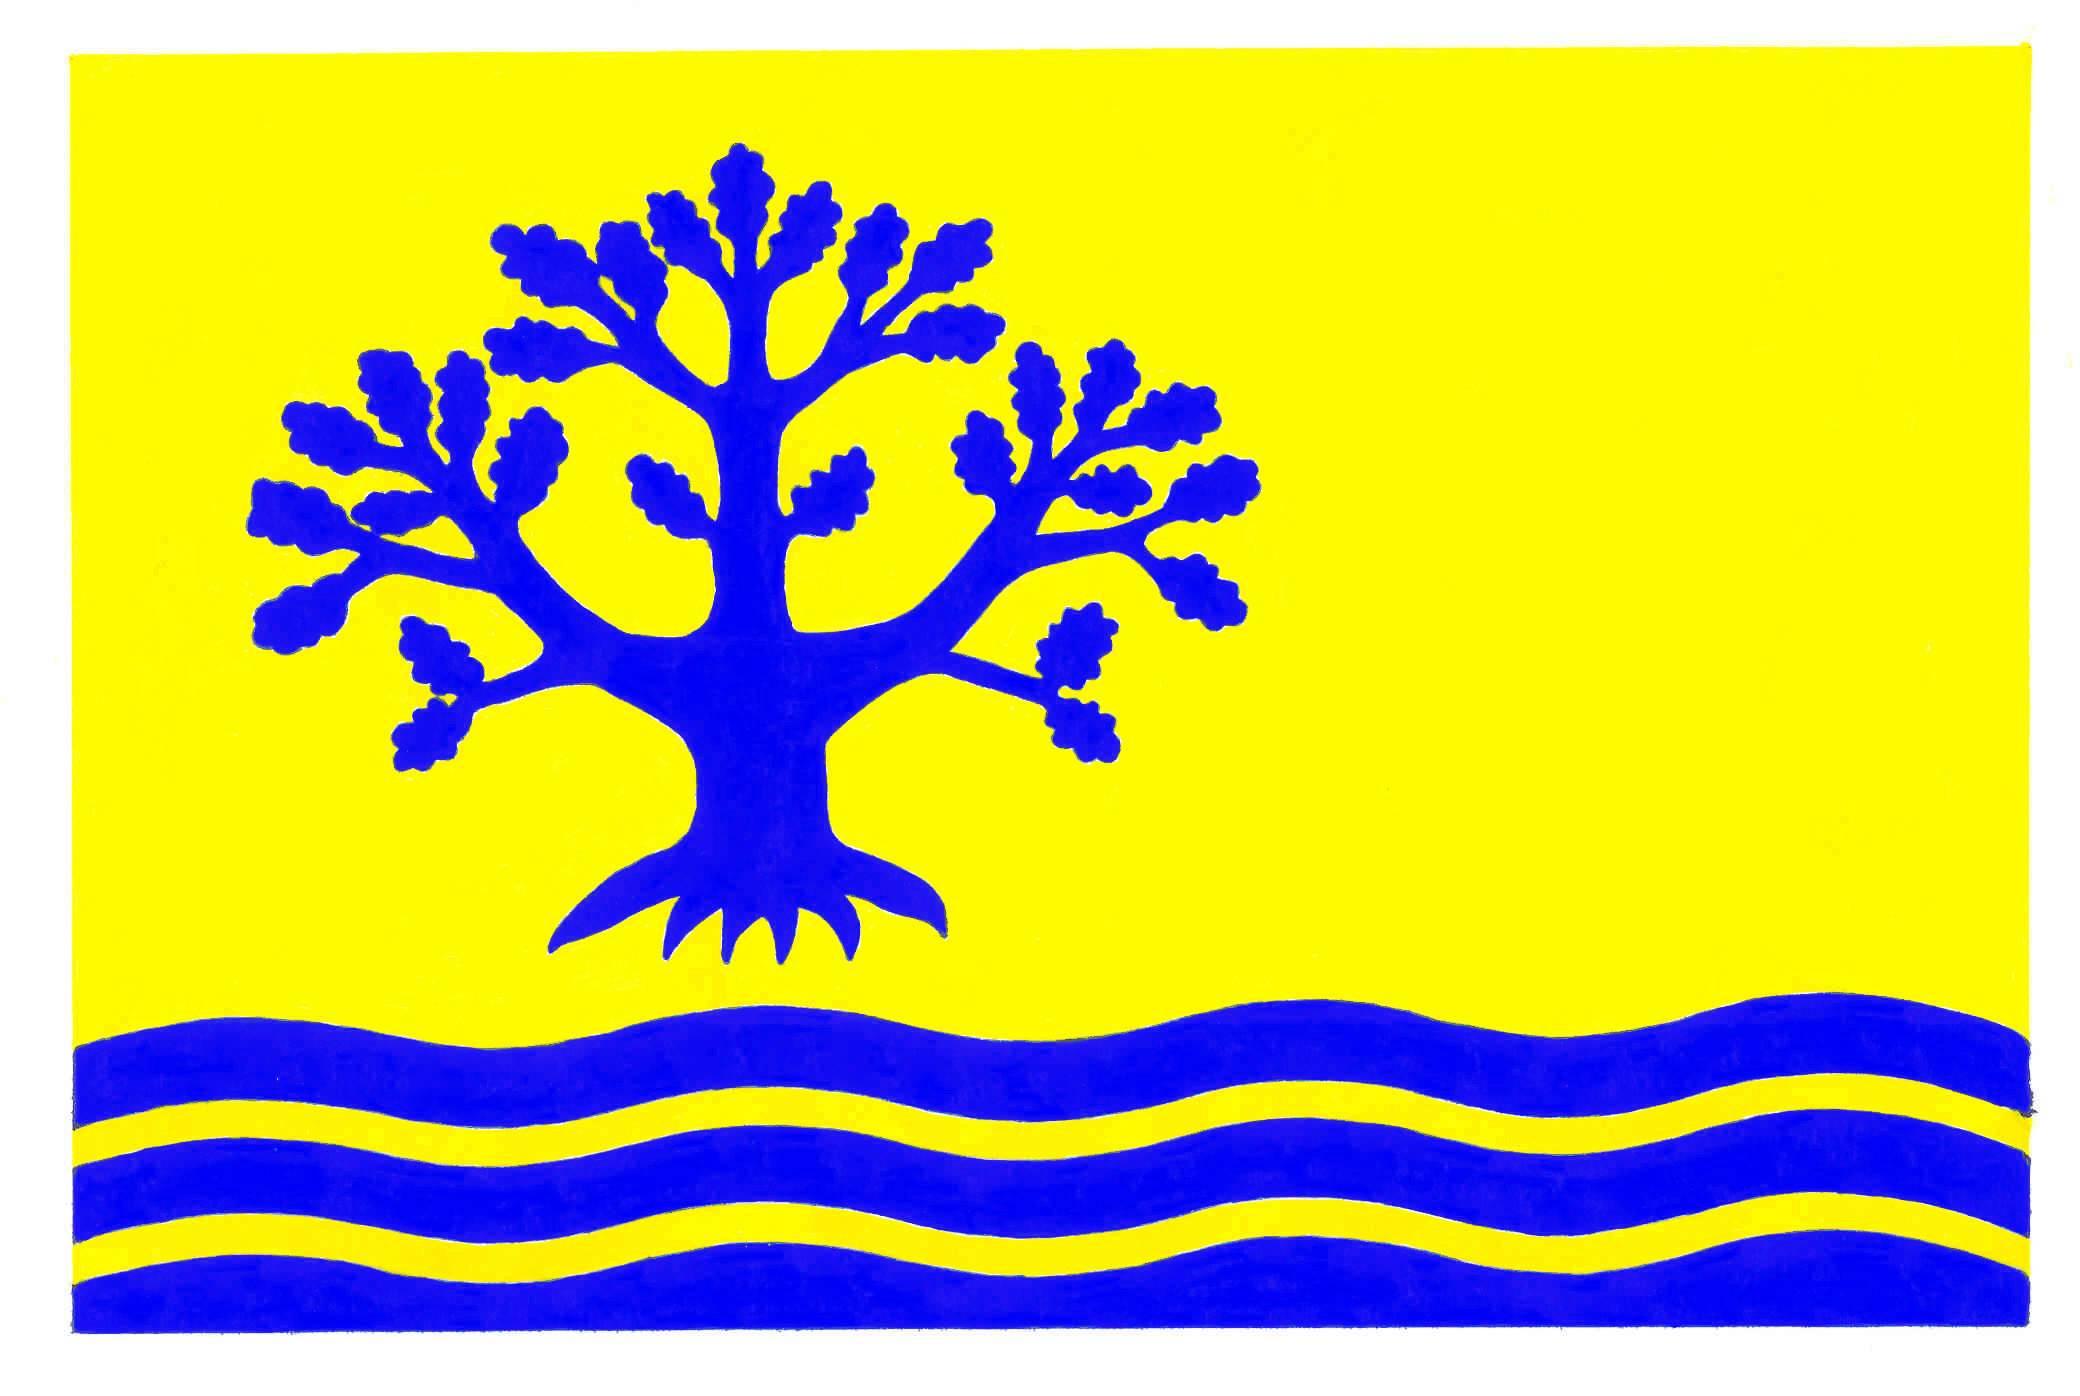 Flagge GemeindeNübel, Kreis Schleswig-Flensburg